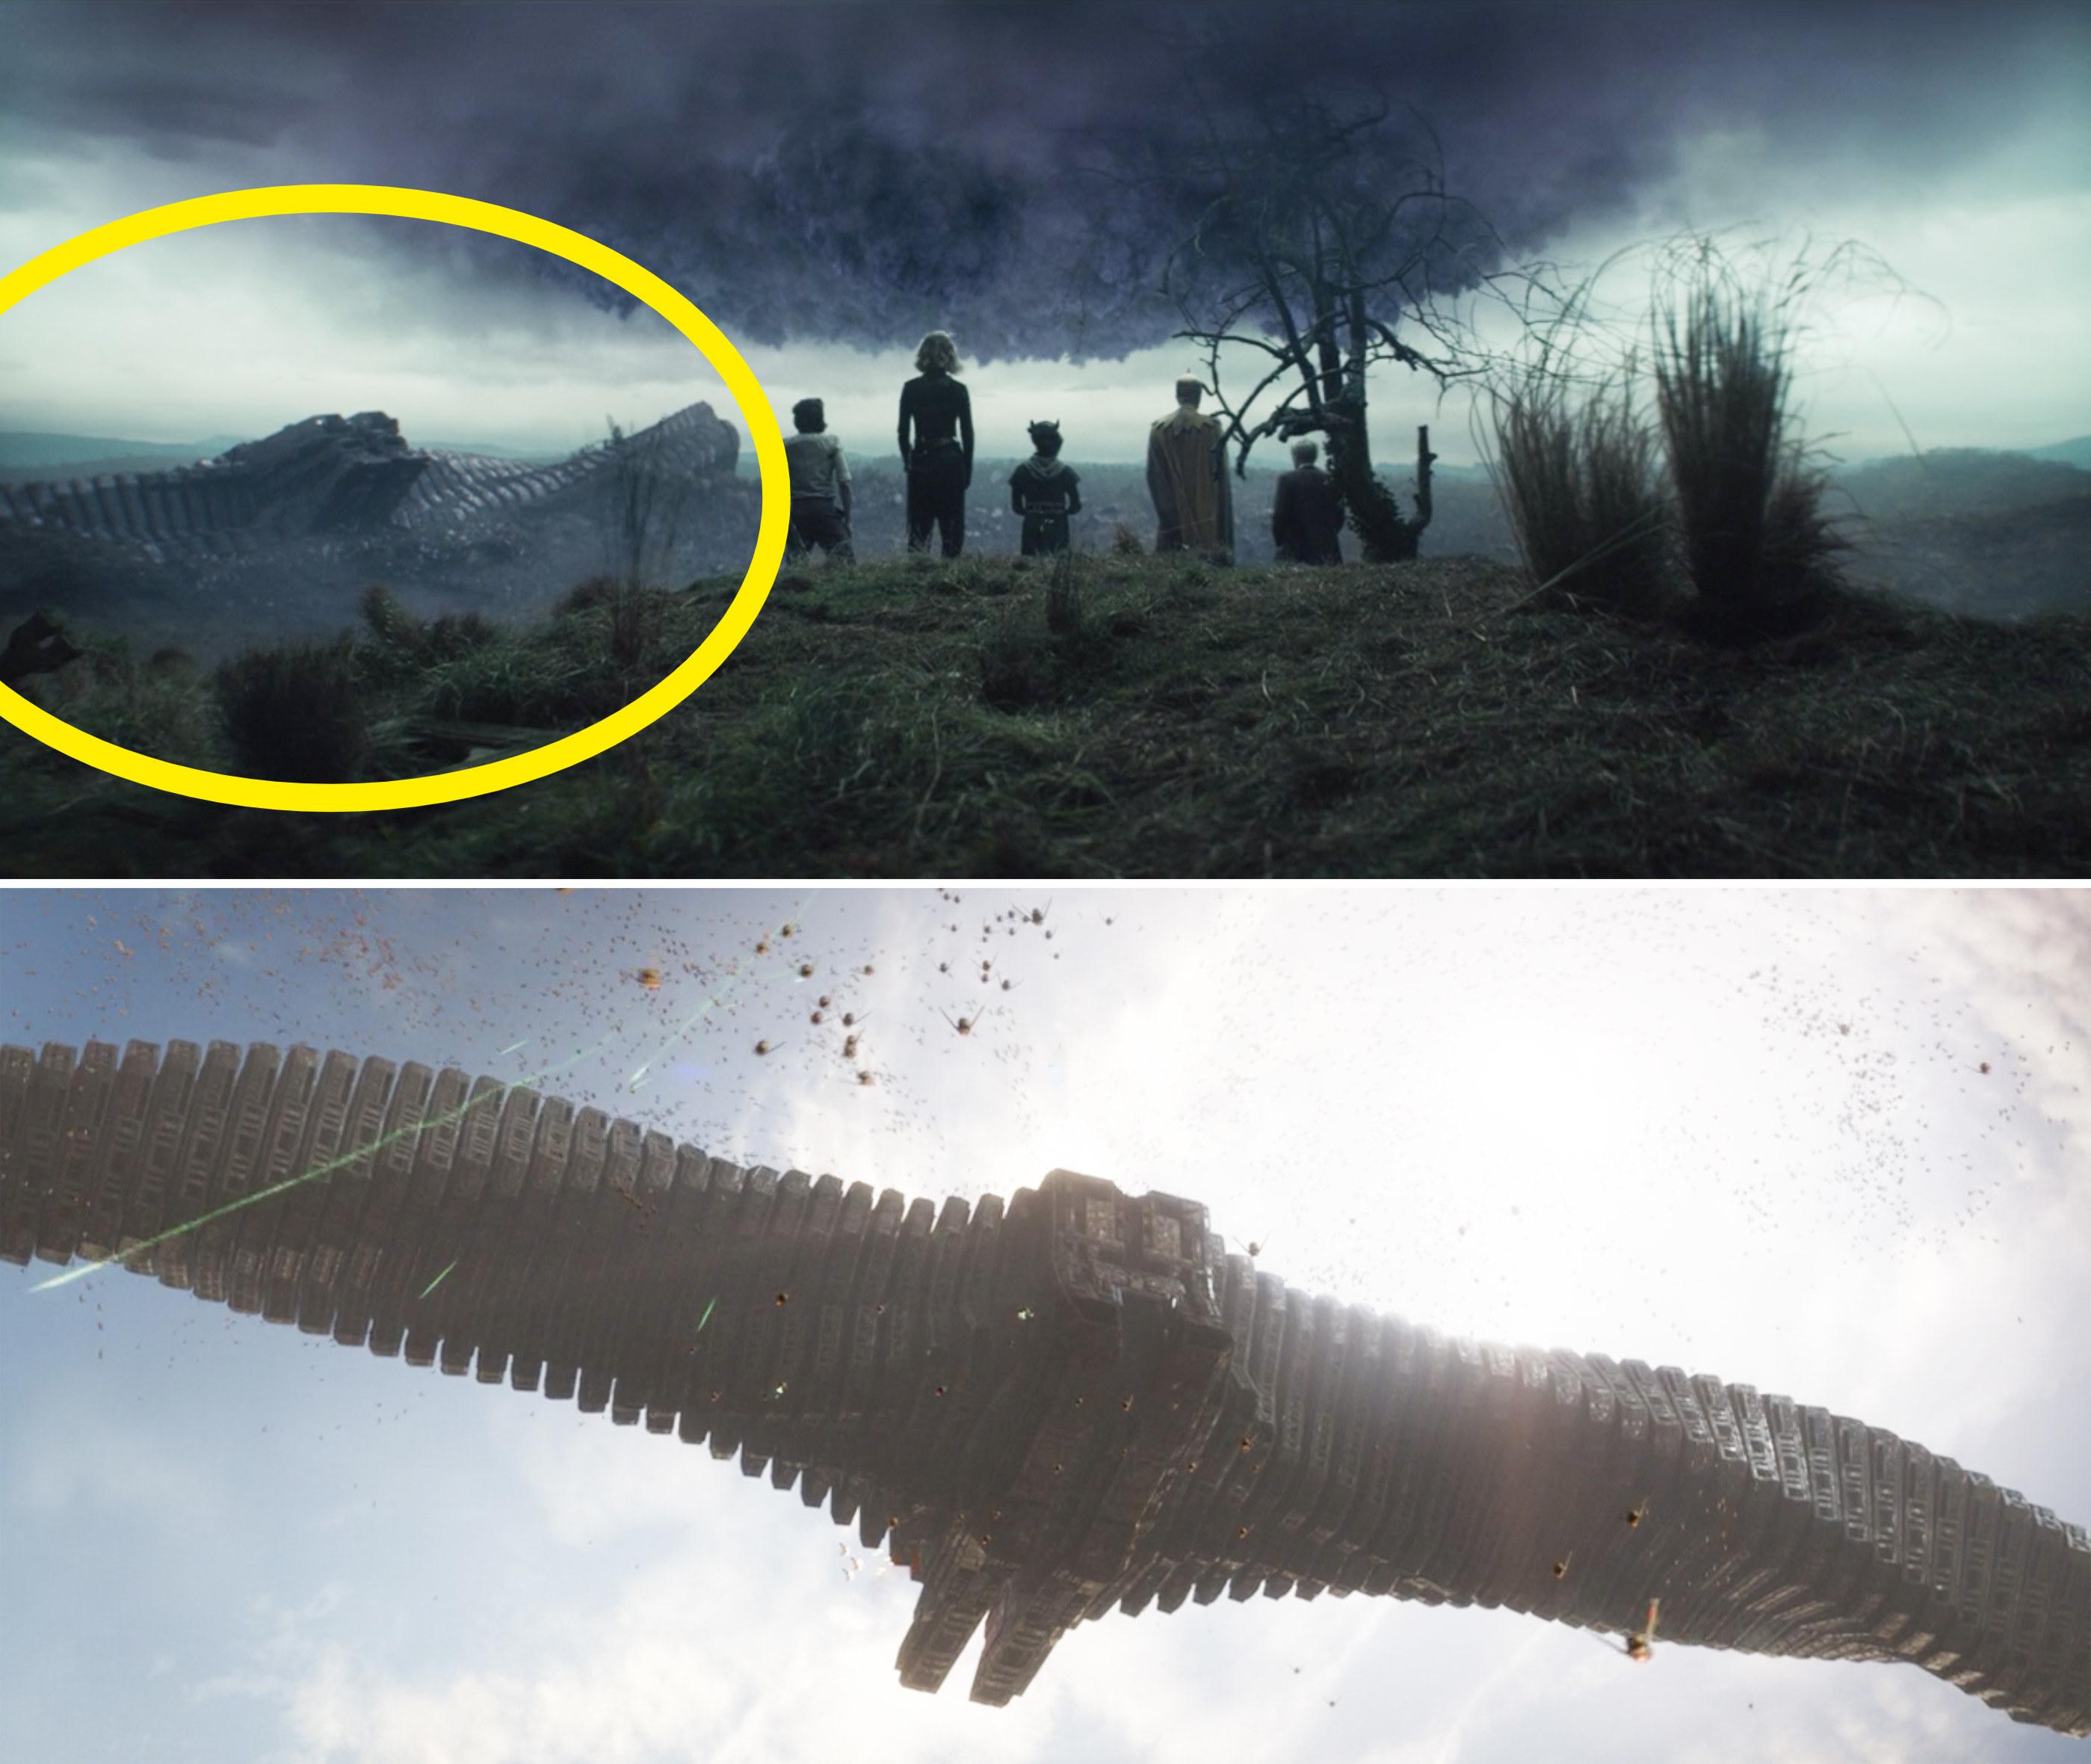 Ronan's ship in the void vs. flying in the sky